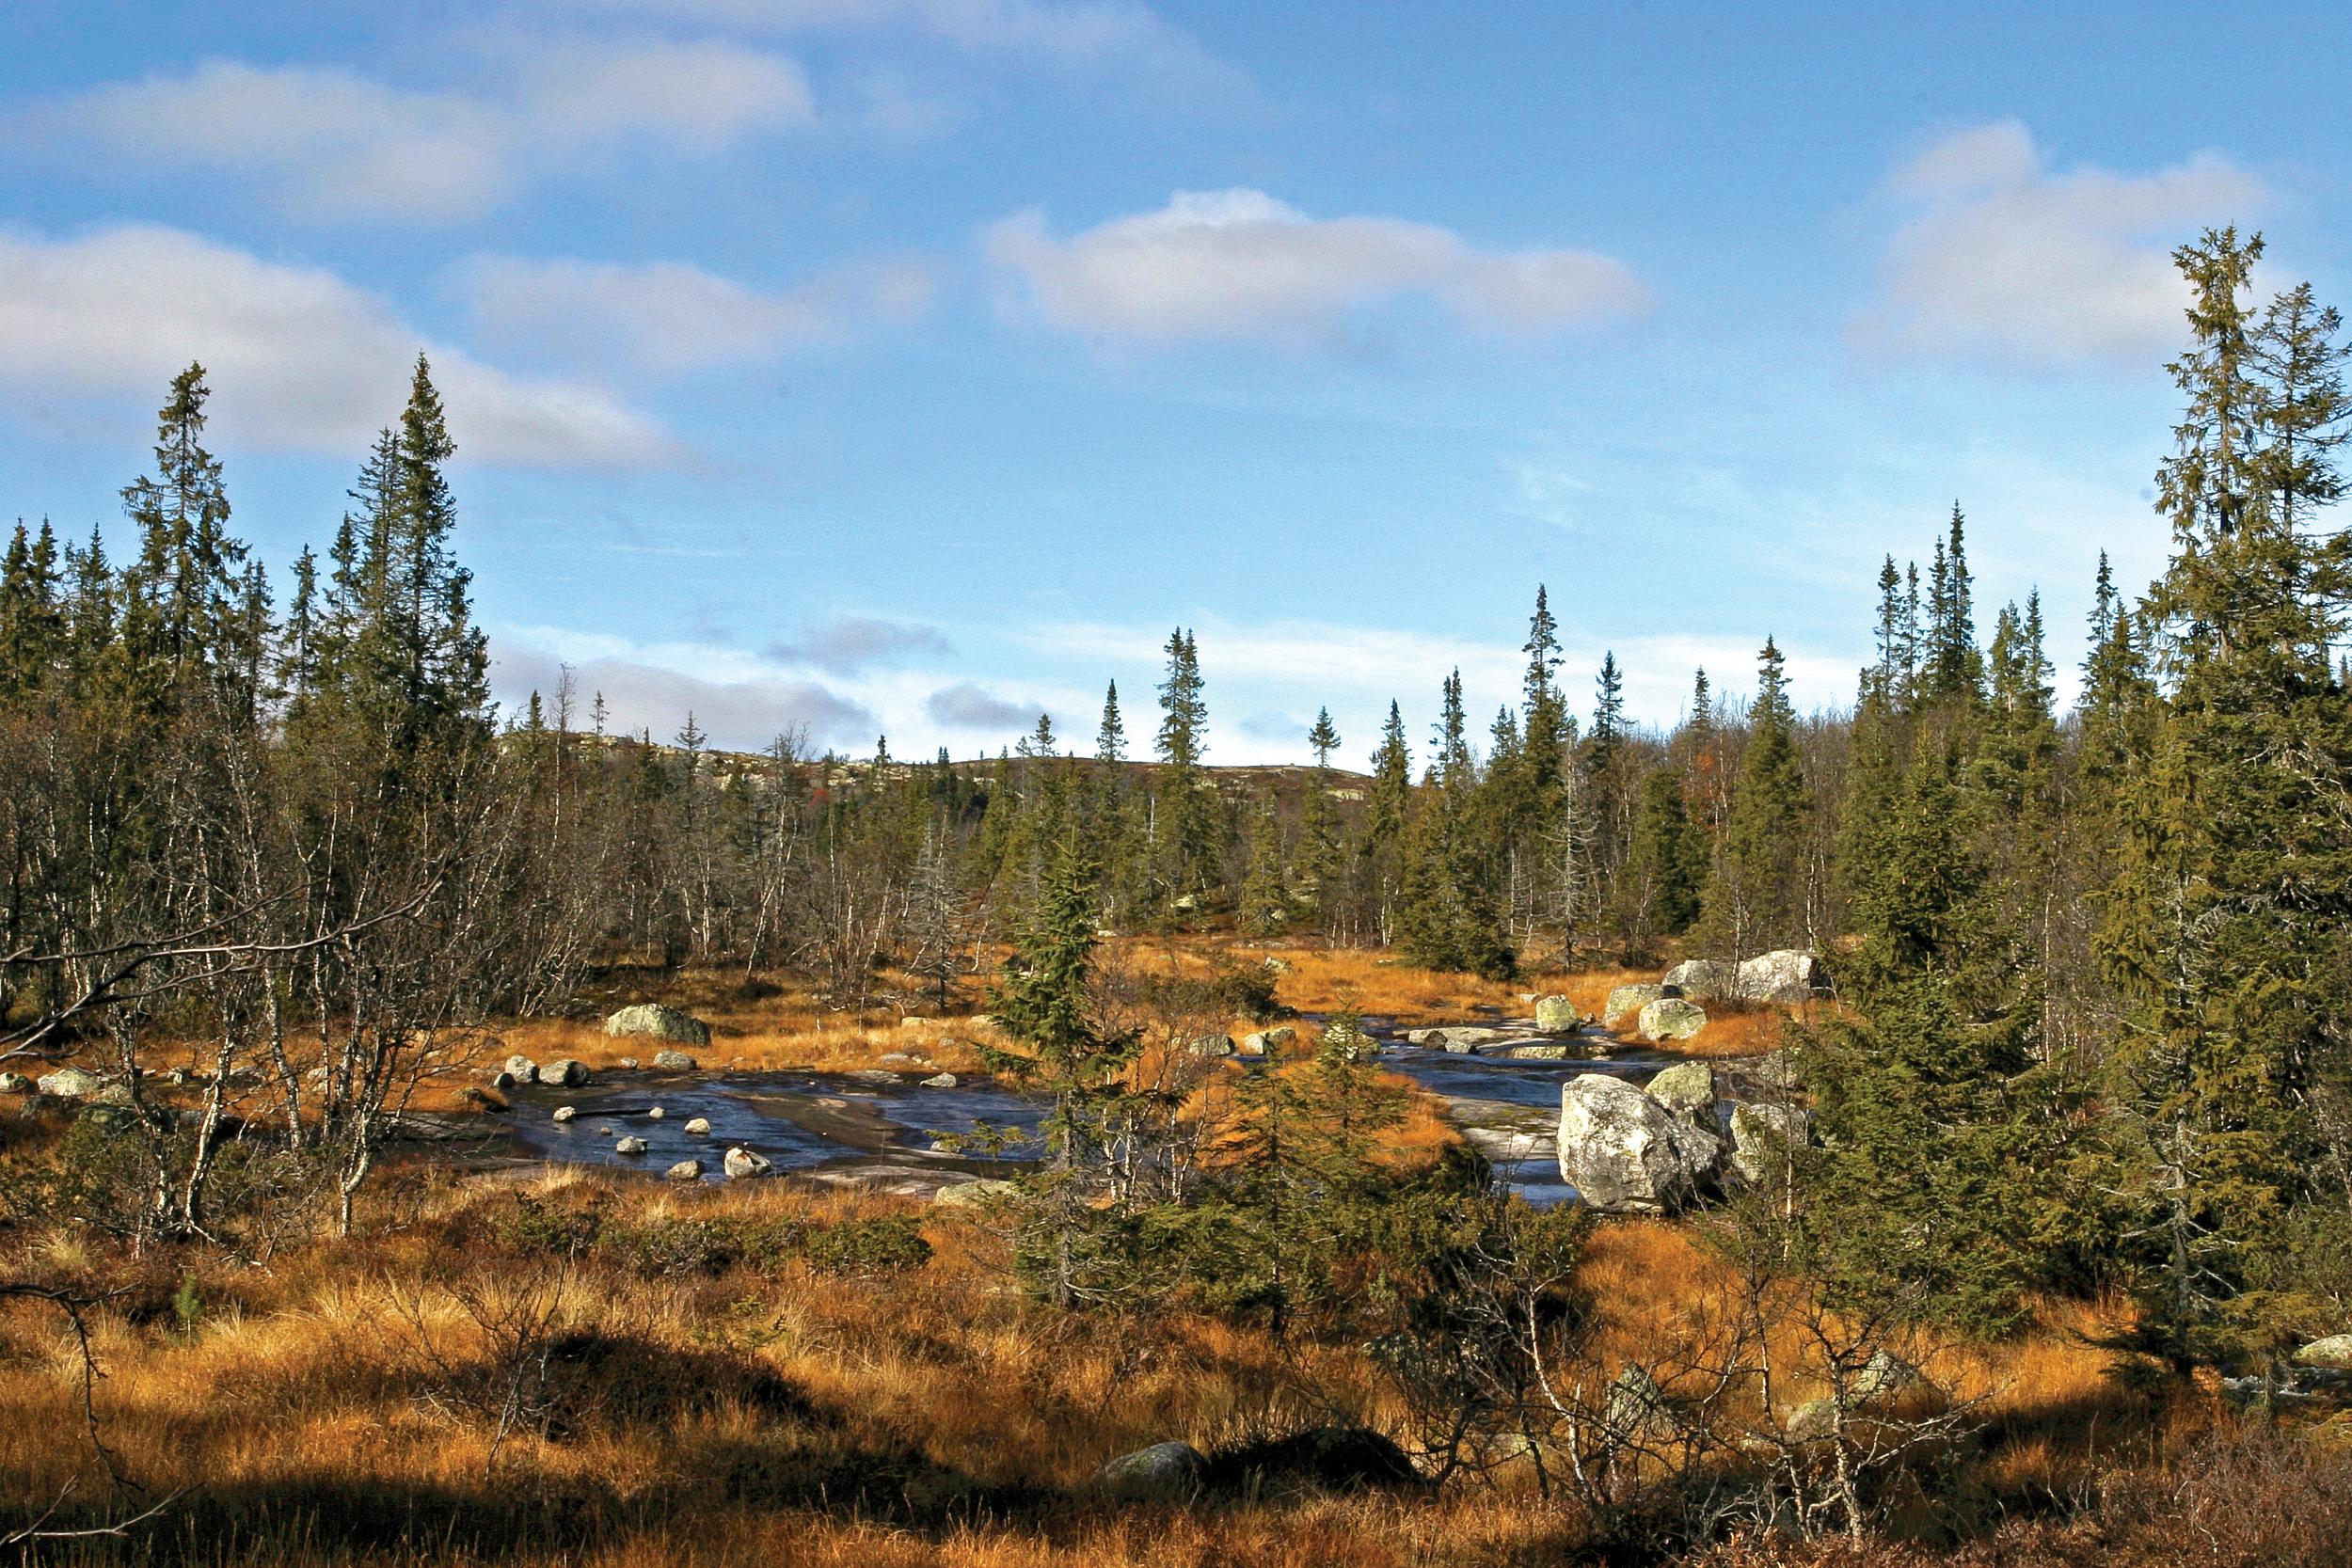 Vernskog er skog som tjener til vern for annen skog eller som vern mot naturskader. Foto: John Yngvar Larsson, NIBIO